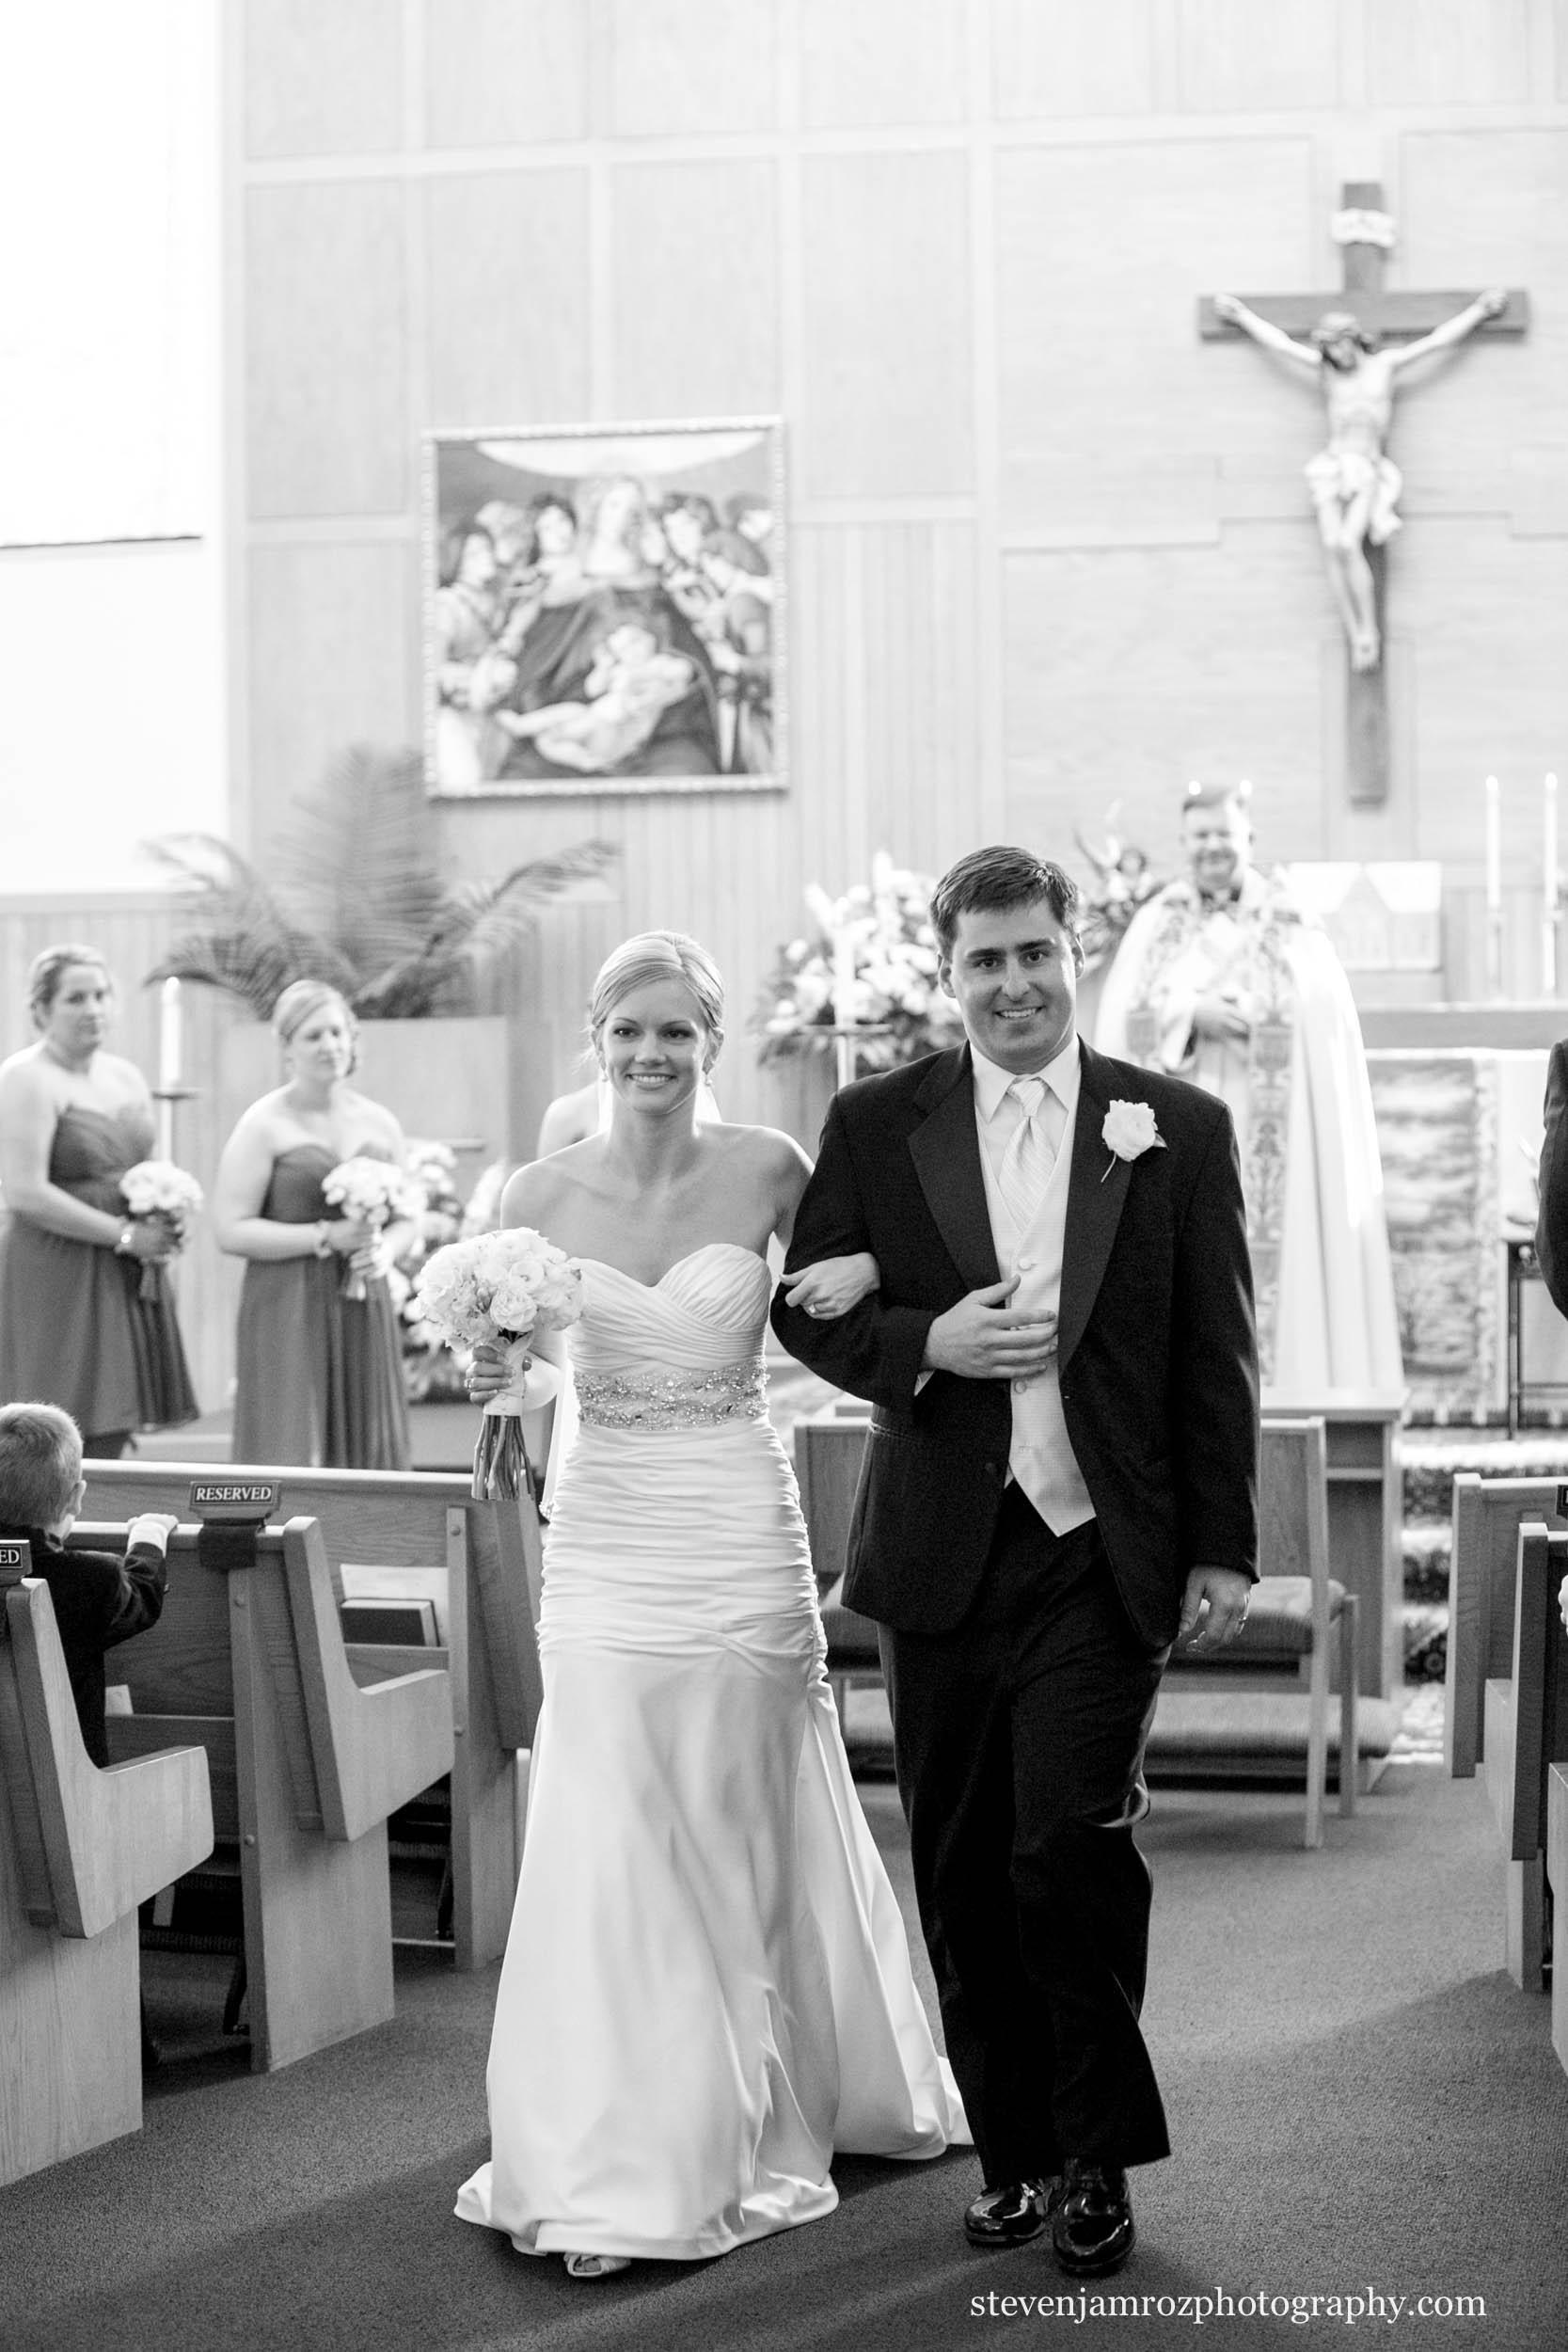 ladyof-the-lourdes-wedding-ceremony-reviews-0910.jpg